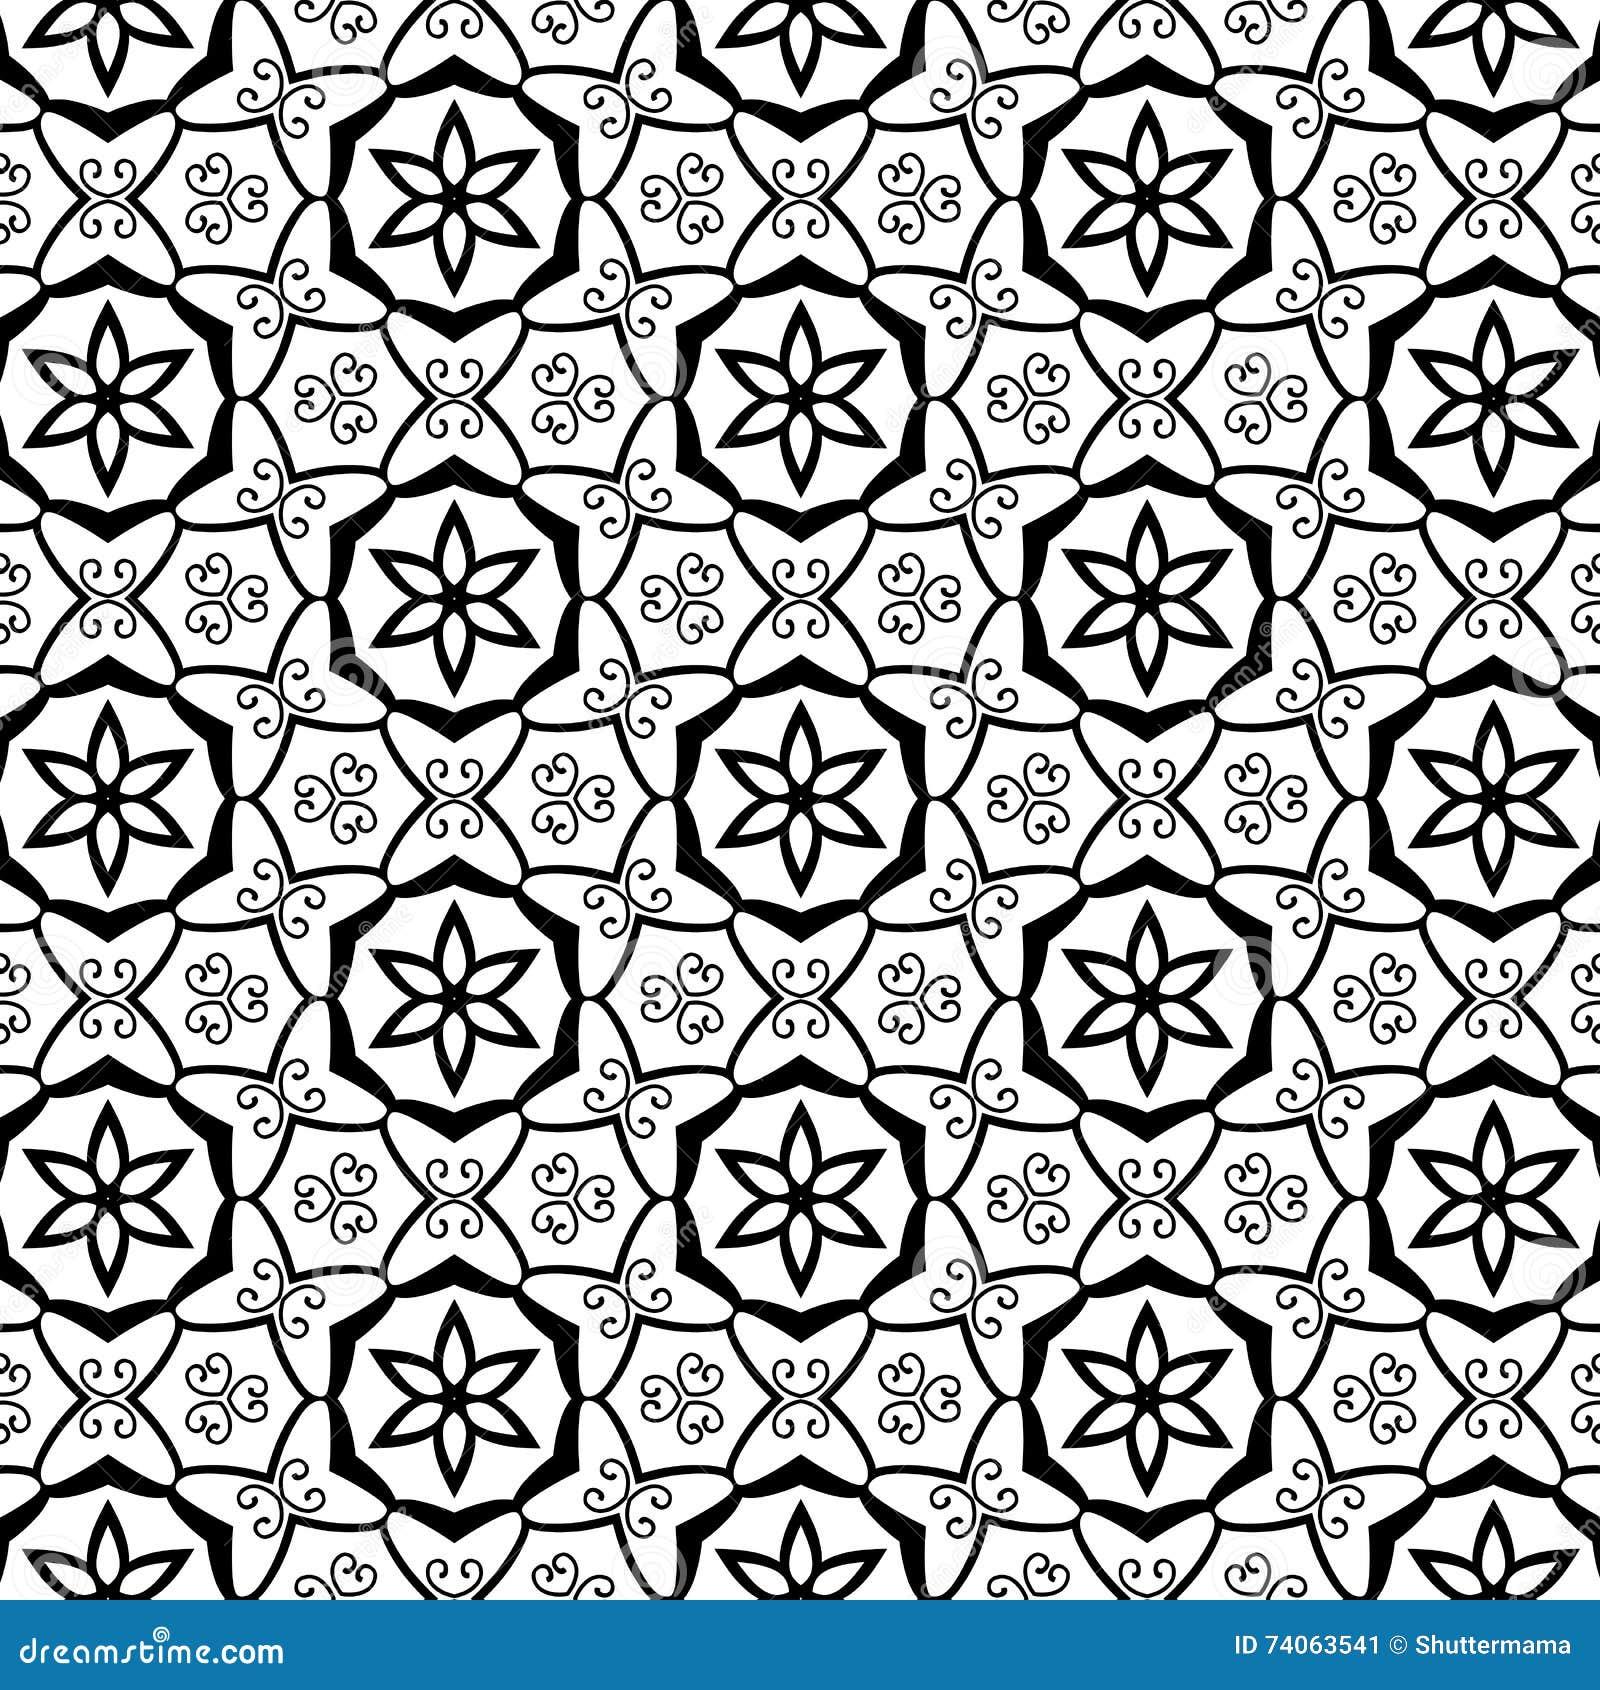 geometric stars ornate swirls flourishes celtic tribal